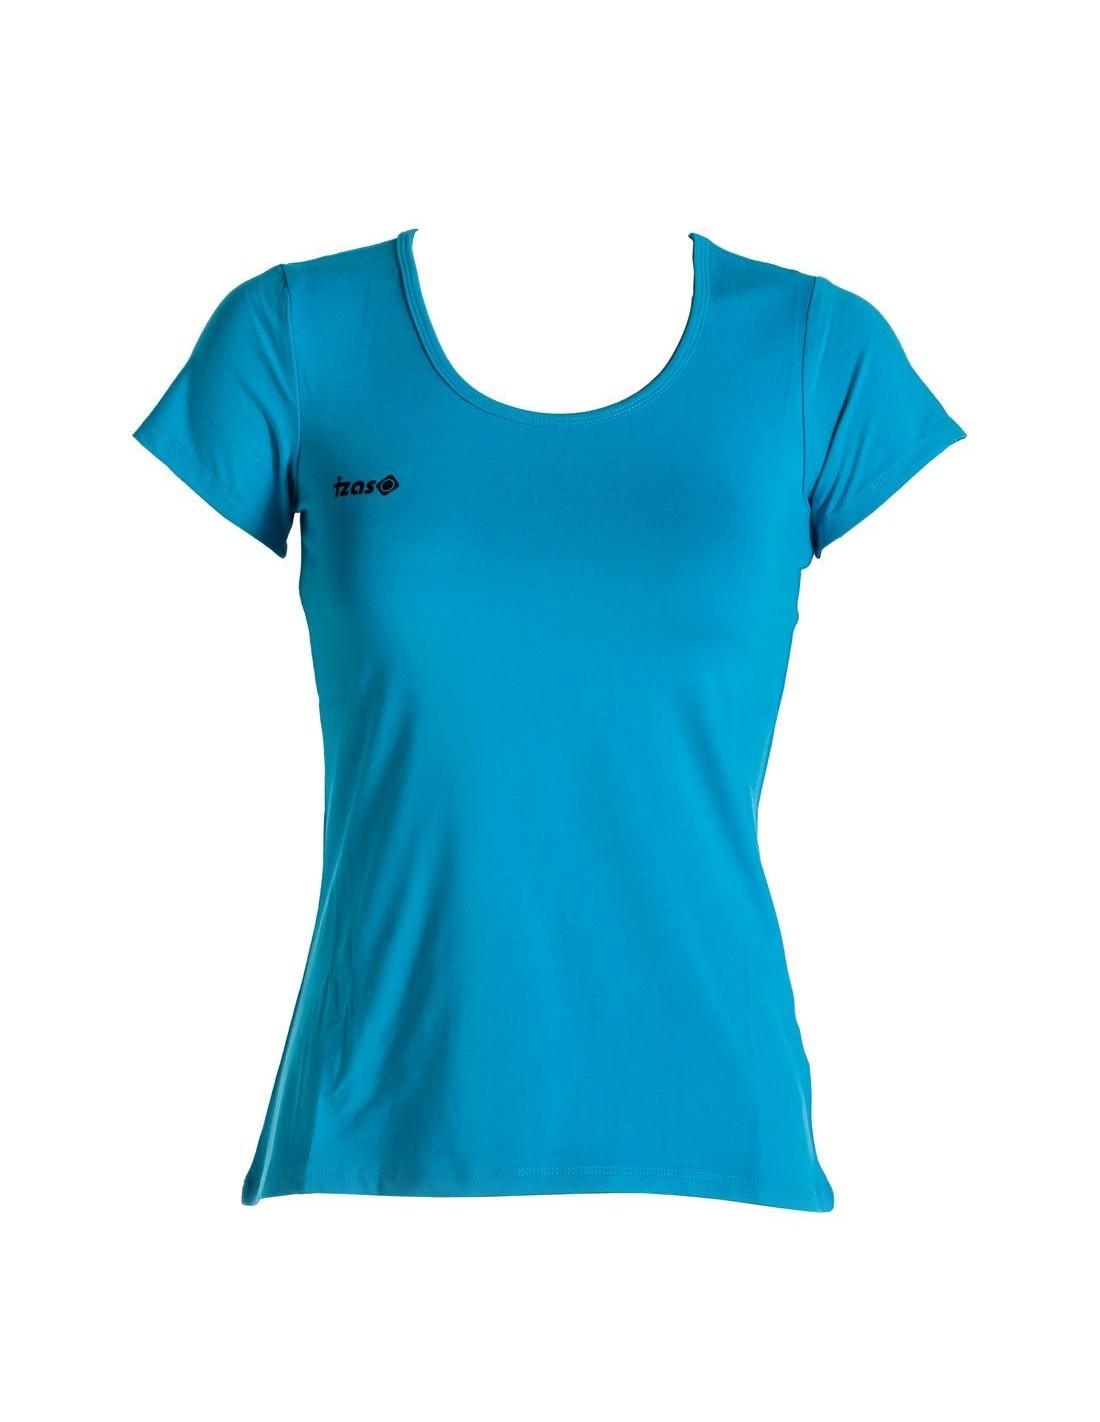 Dadia Izas Camiseta Woman